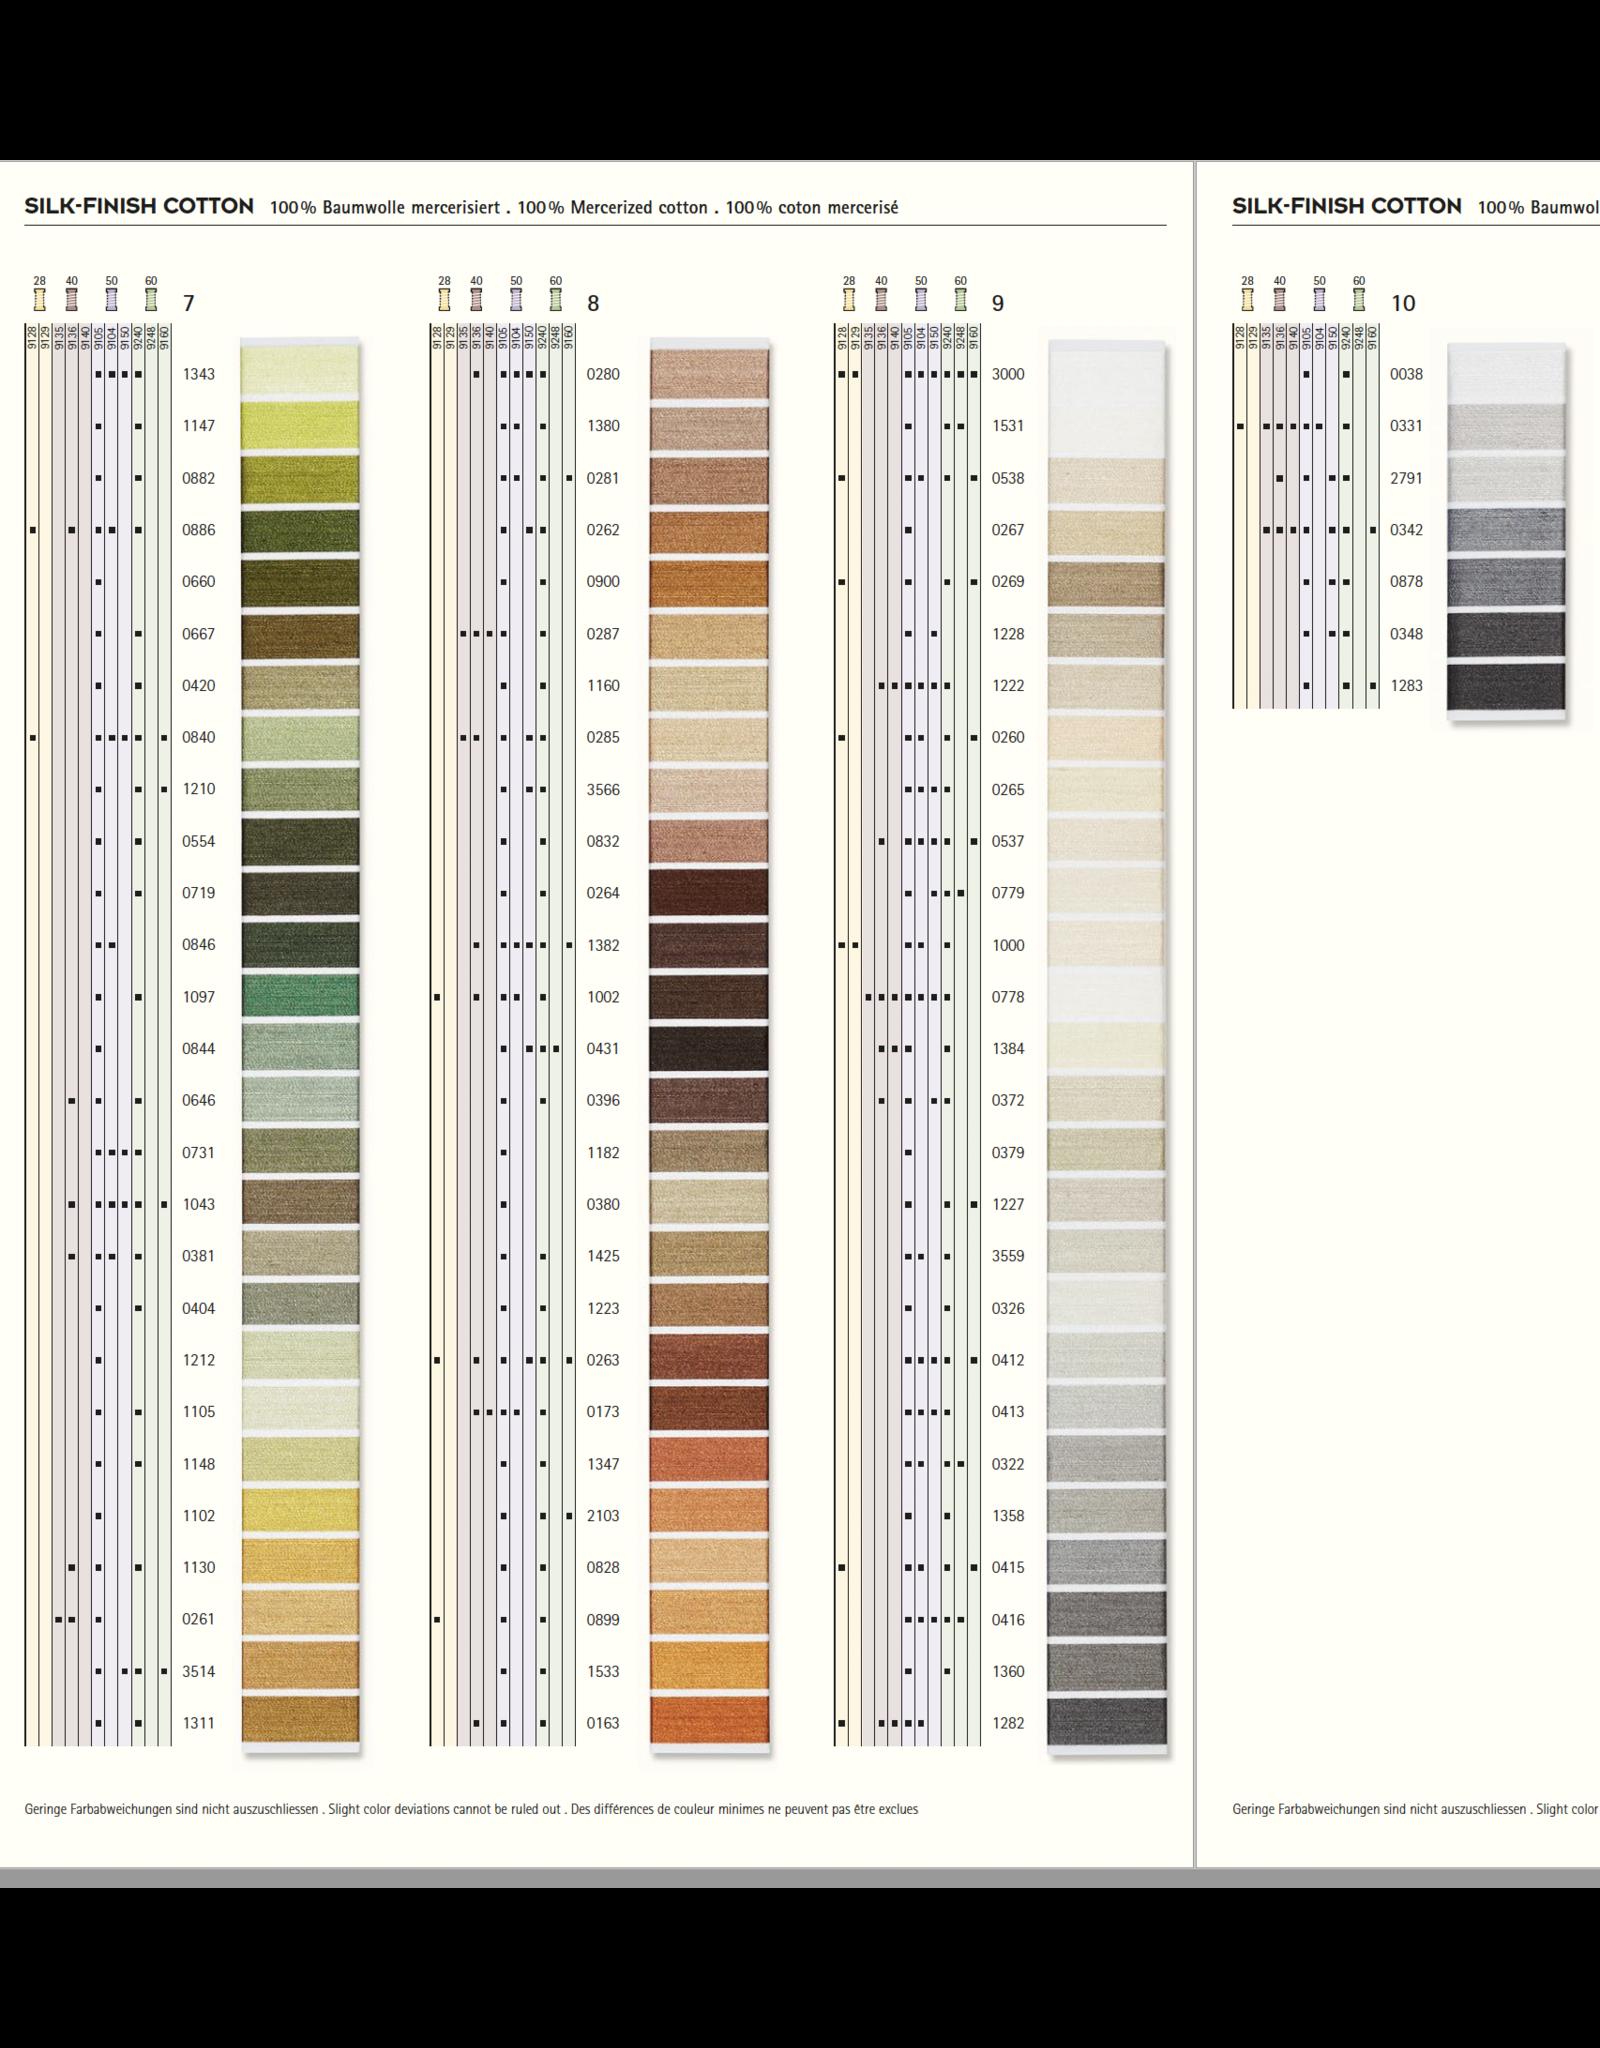 Mettler Kleurkaart 3 - Silk Finish Cotton 50 - 150 meter